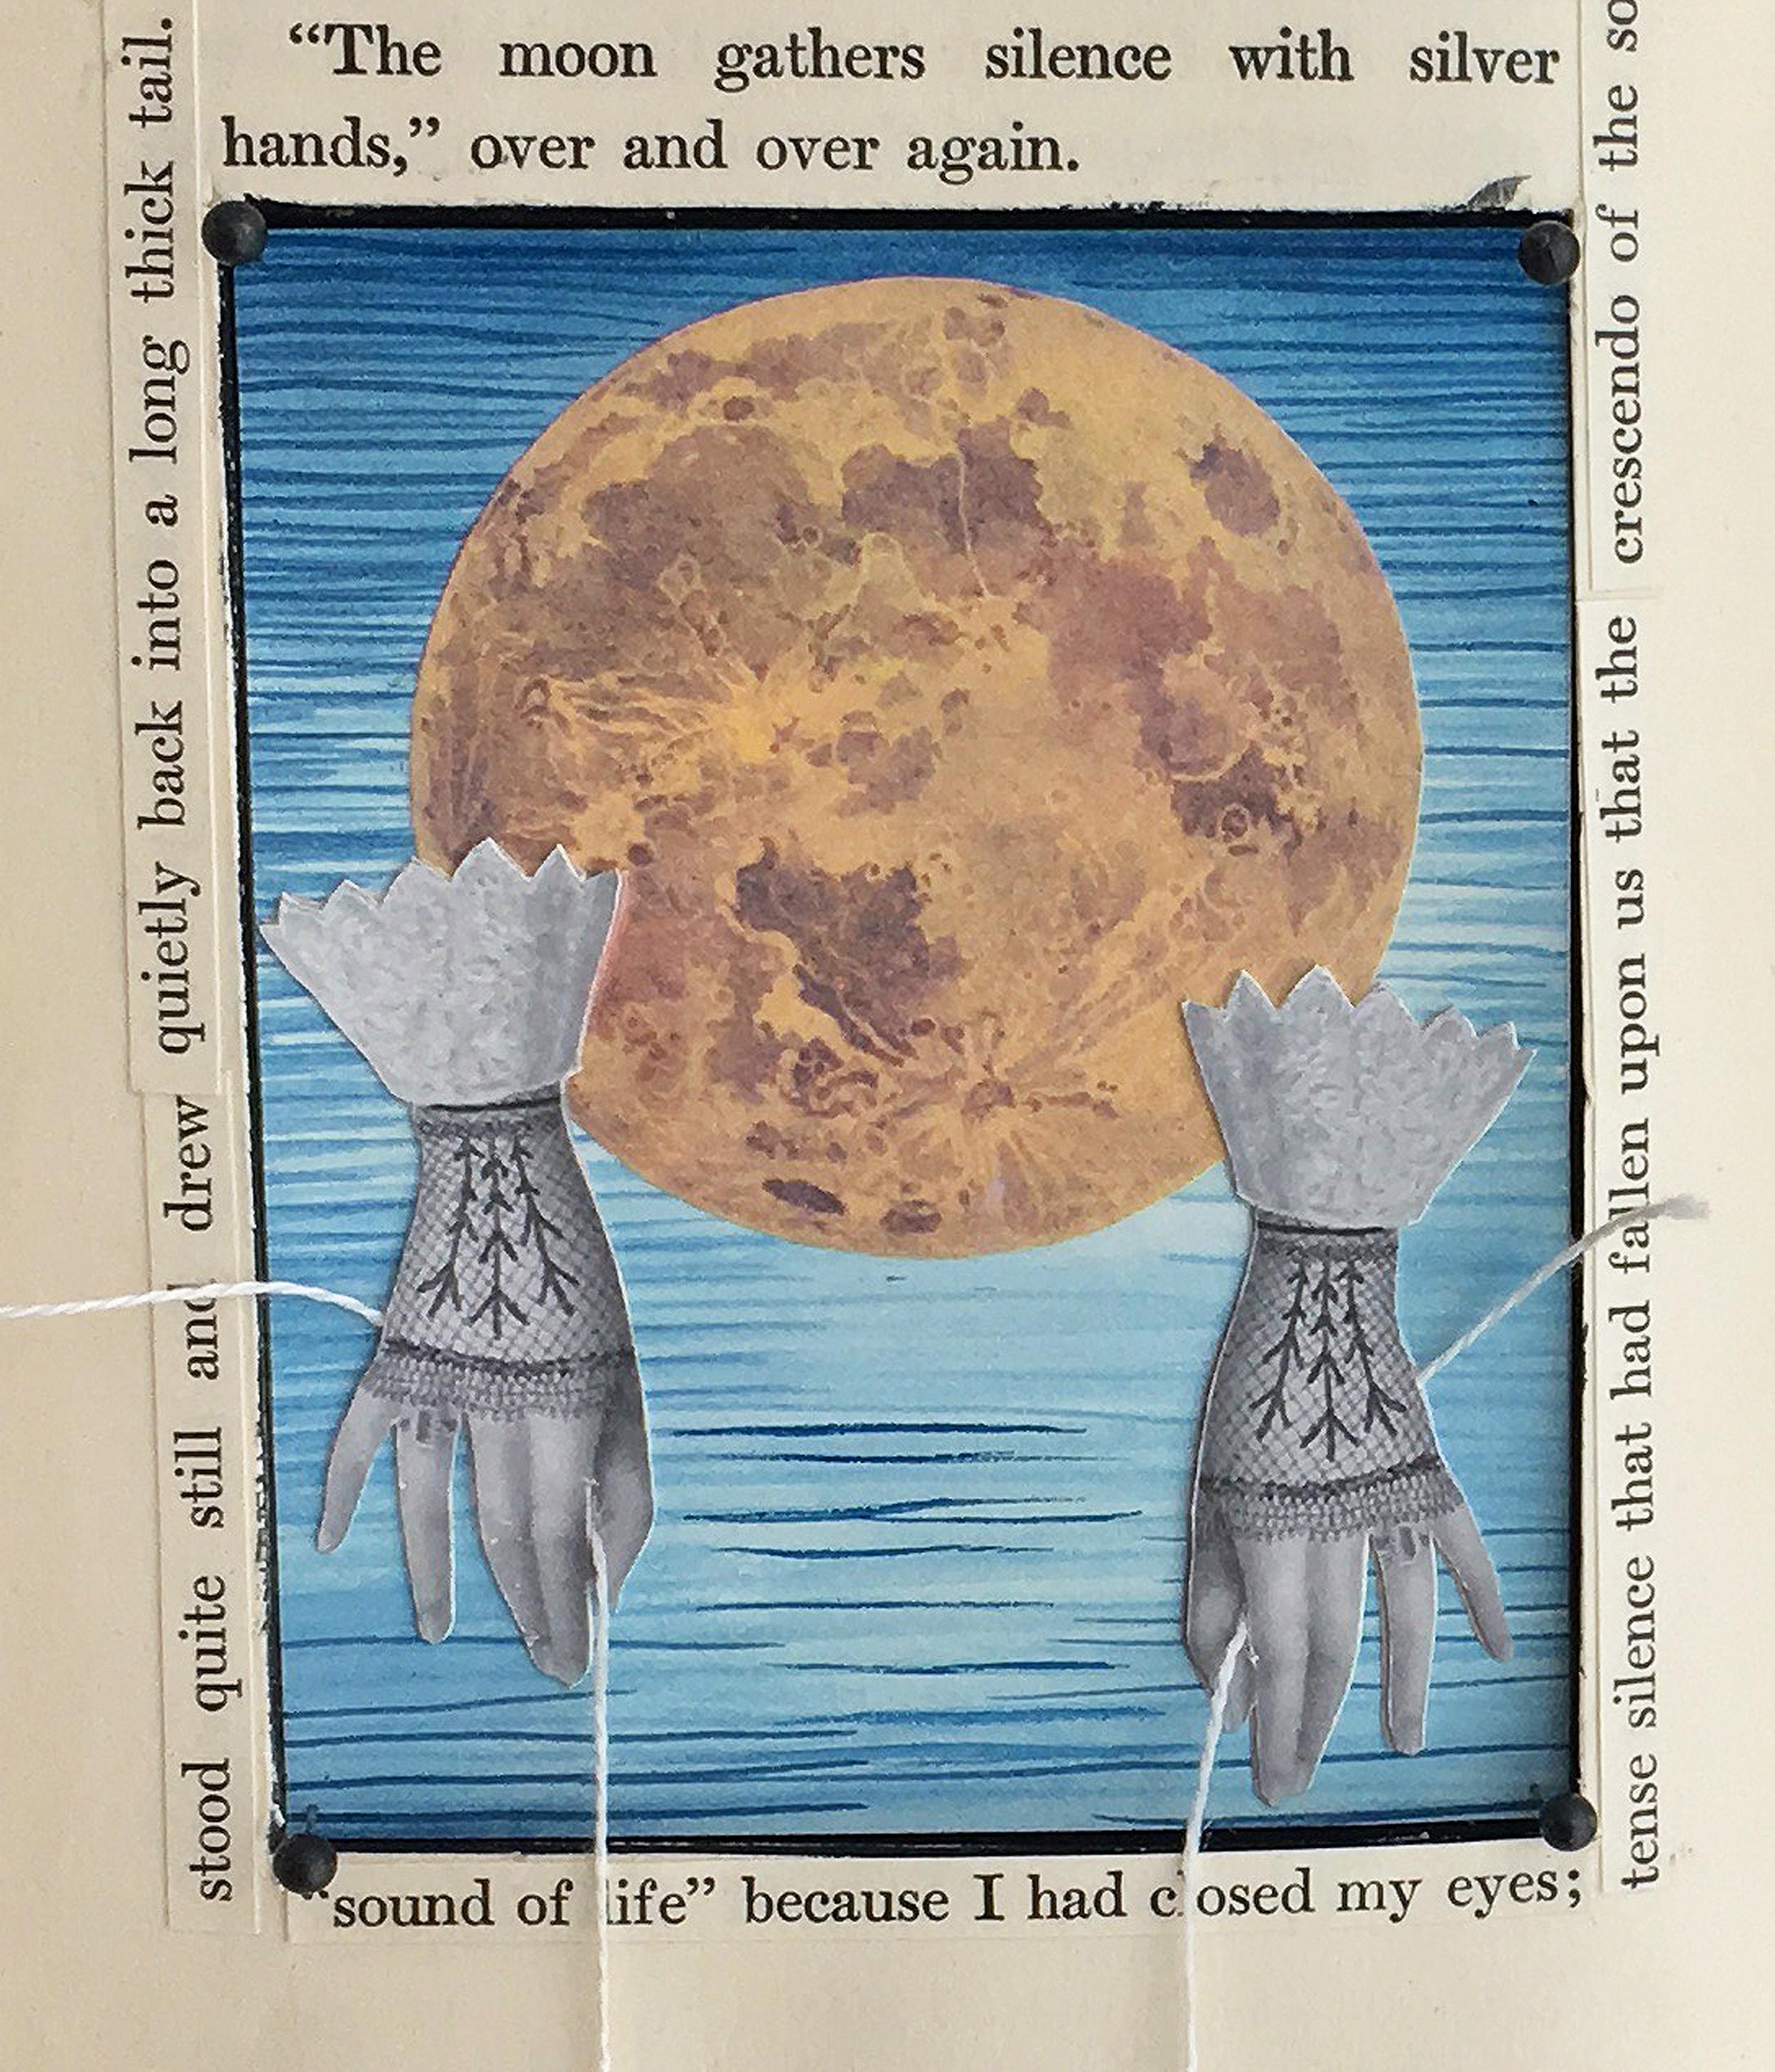 Hari Book Art moon detail 10 By Patrushka cropped.jpg